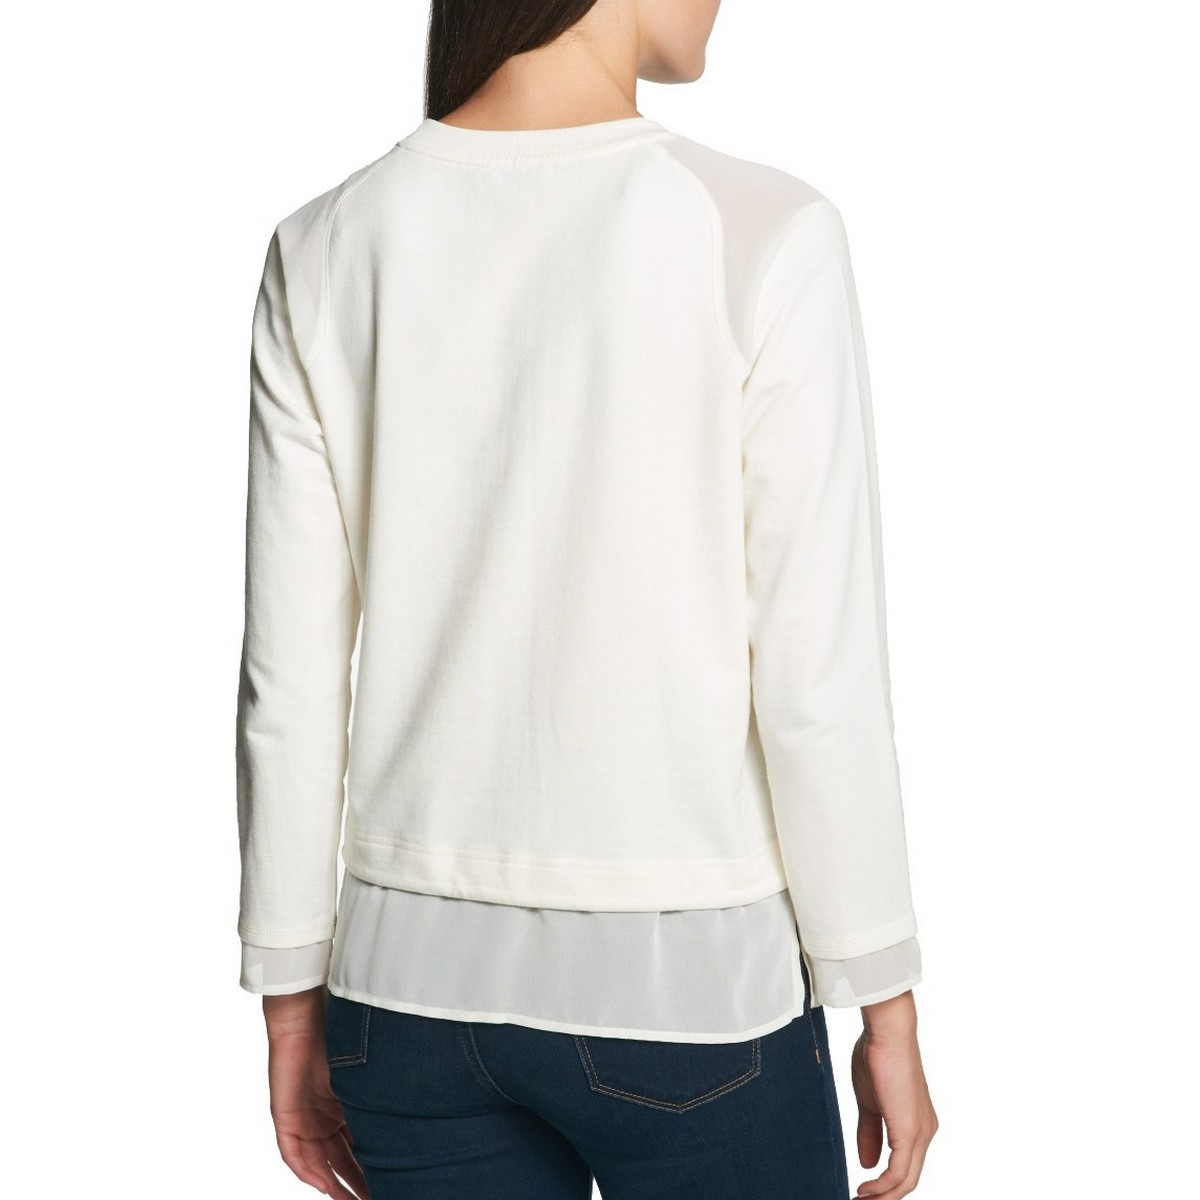 TOMMY-HILFIGER-Women-039-s-Layered-look-Sheer-Trim-Logo-Sweatshirt-Top-TEDO thumbnail 6